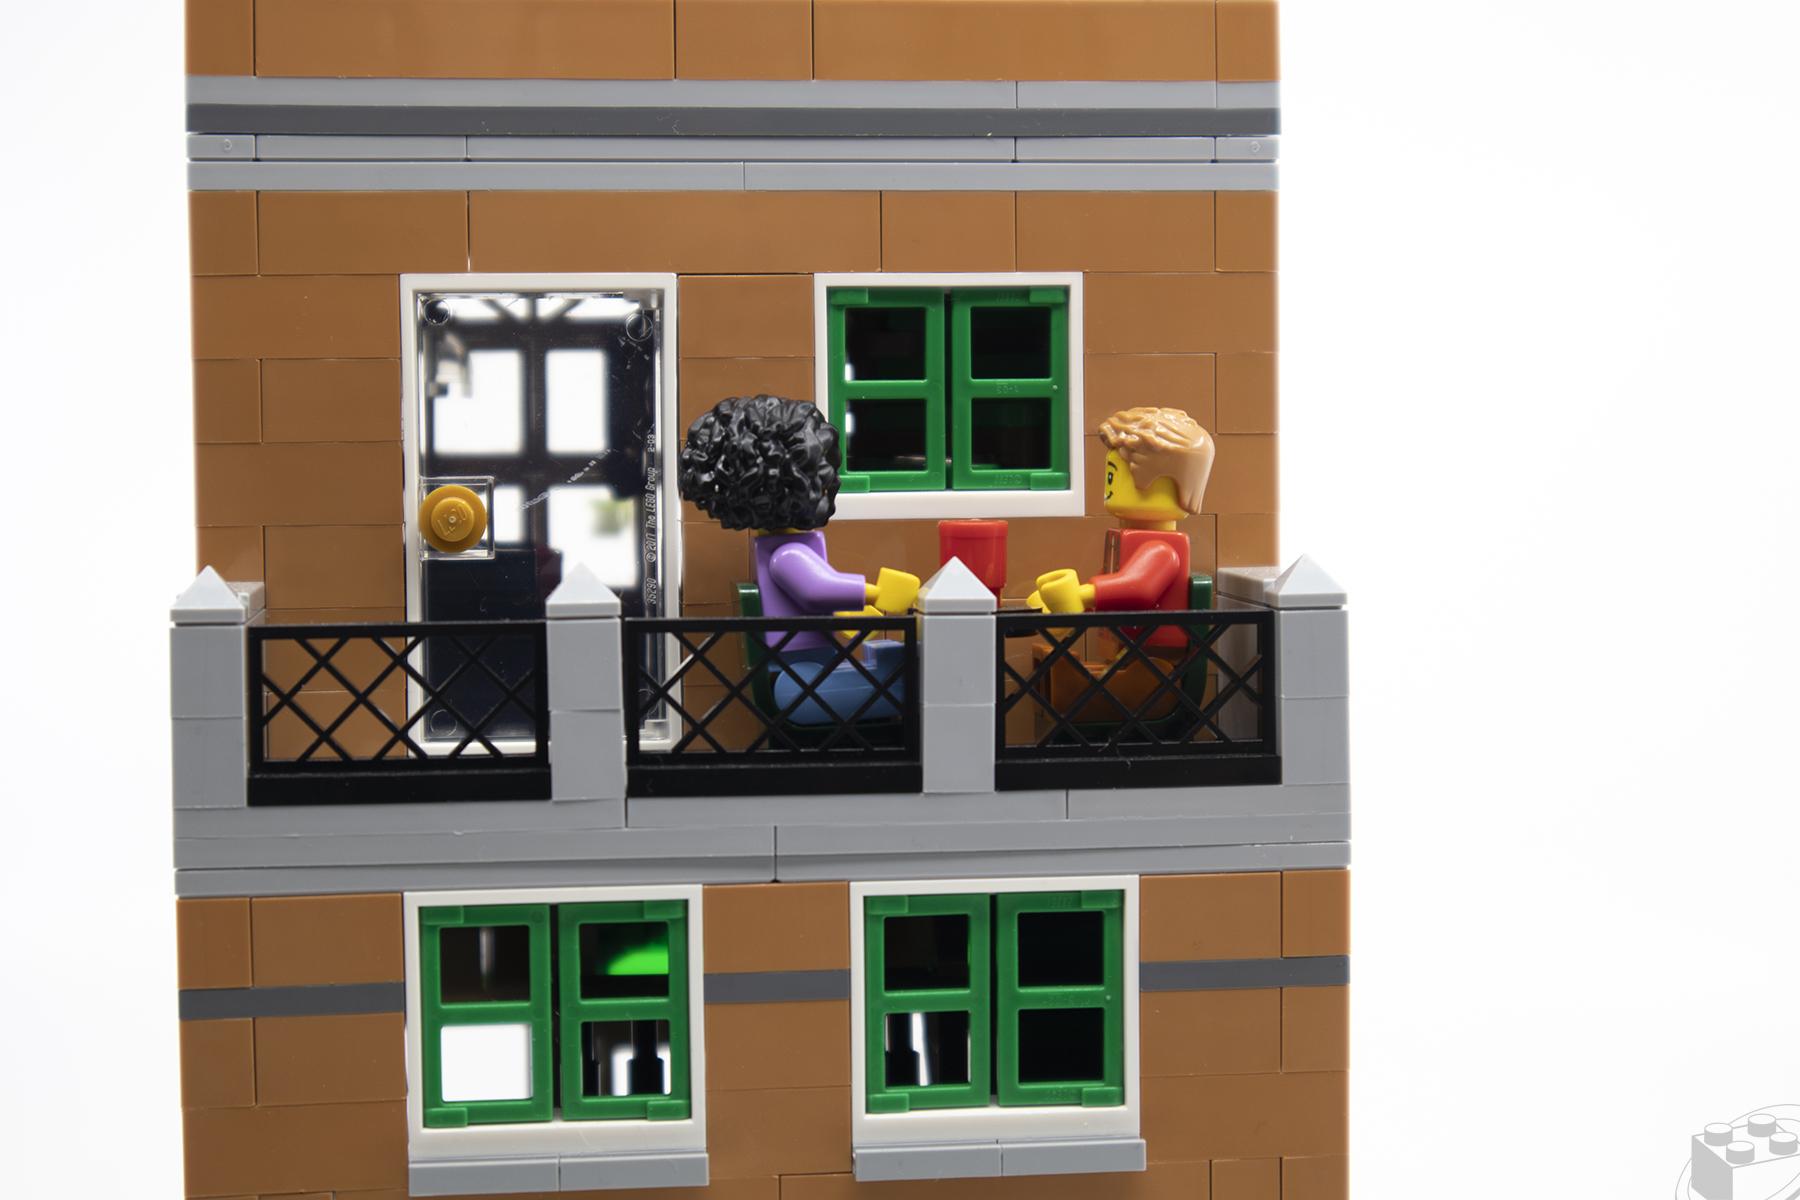 lego-bookshop-06